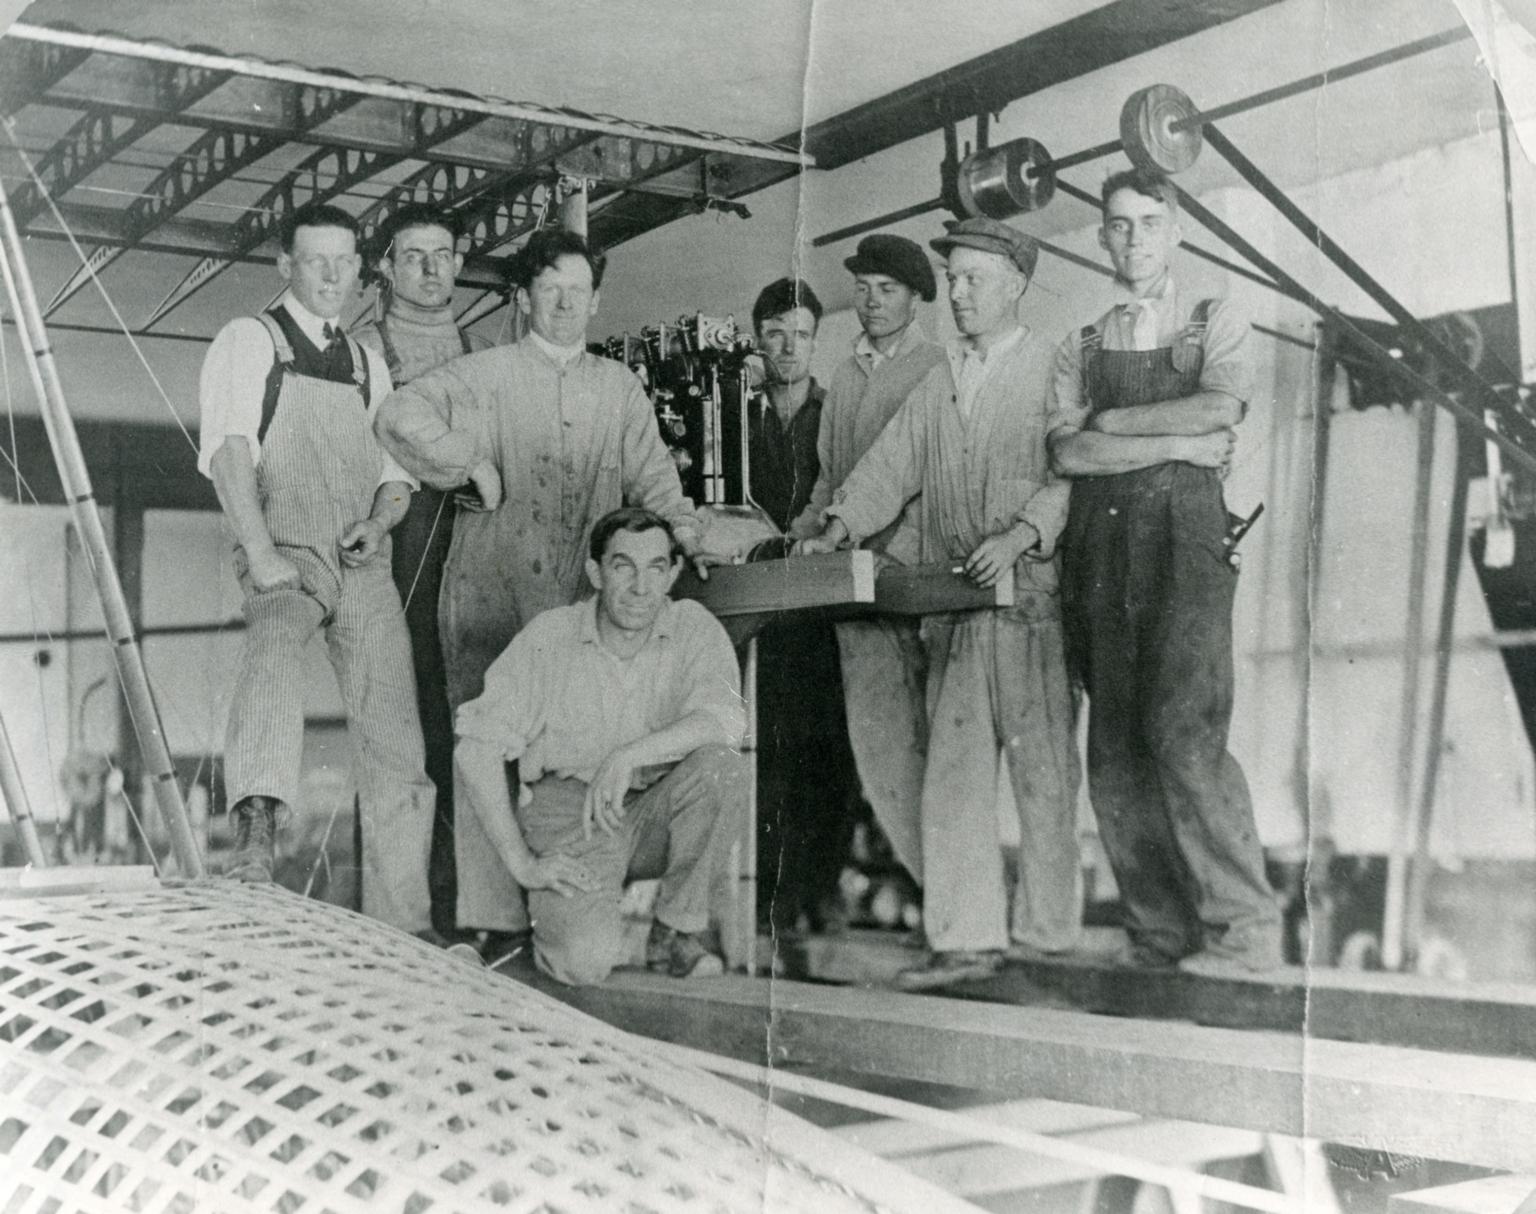 Lockheed Brothers and Crew